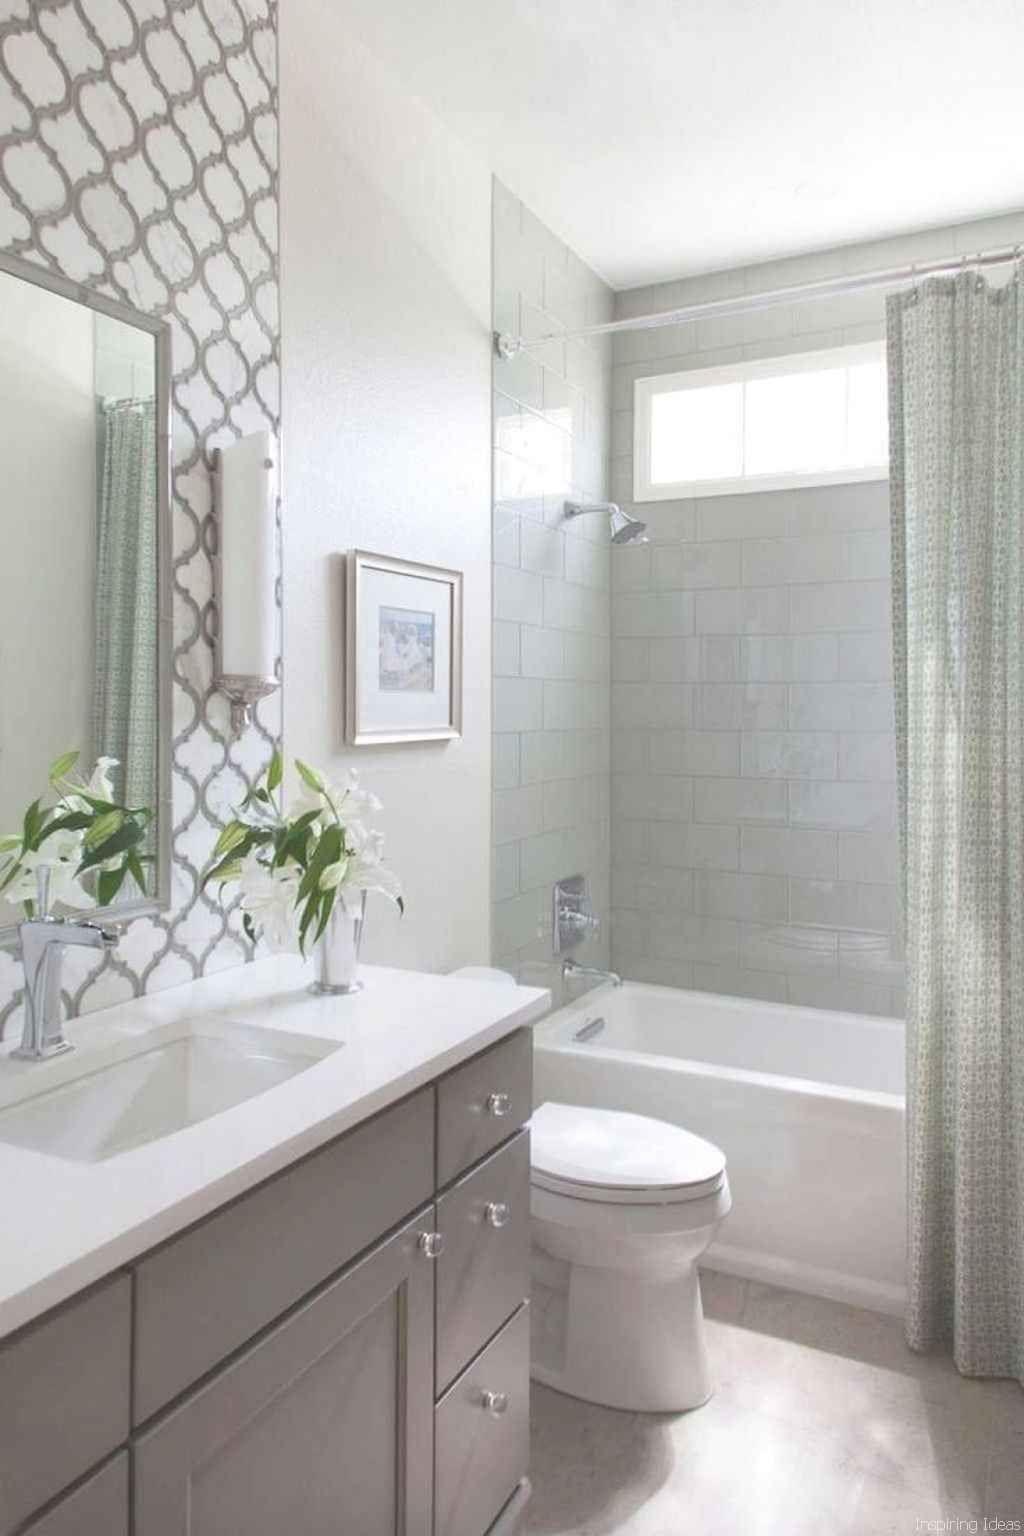 50 Smart Bathroom Shower Tile Ideas On A Budget05 Augustexture Com In 2020 Cheap Bathroom Remodel Bathroom Tub Shower Combo Small Bathroom Renovations